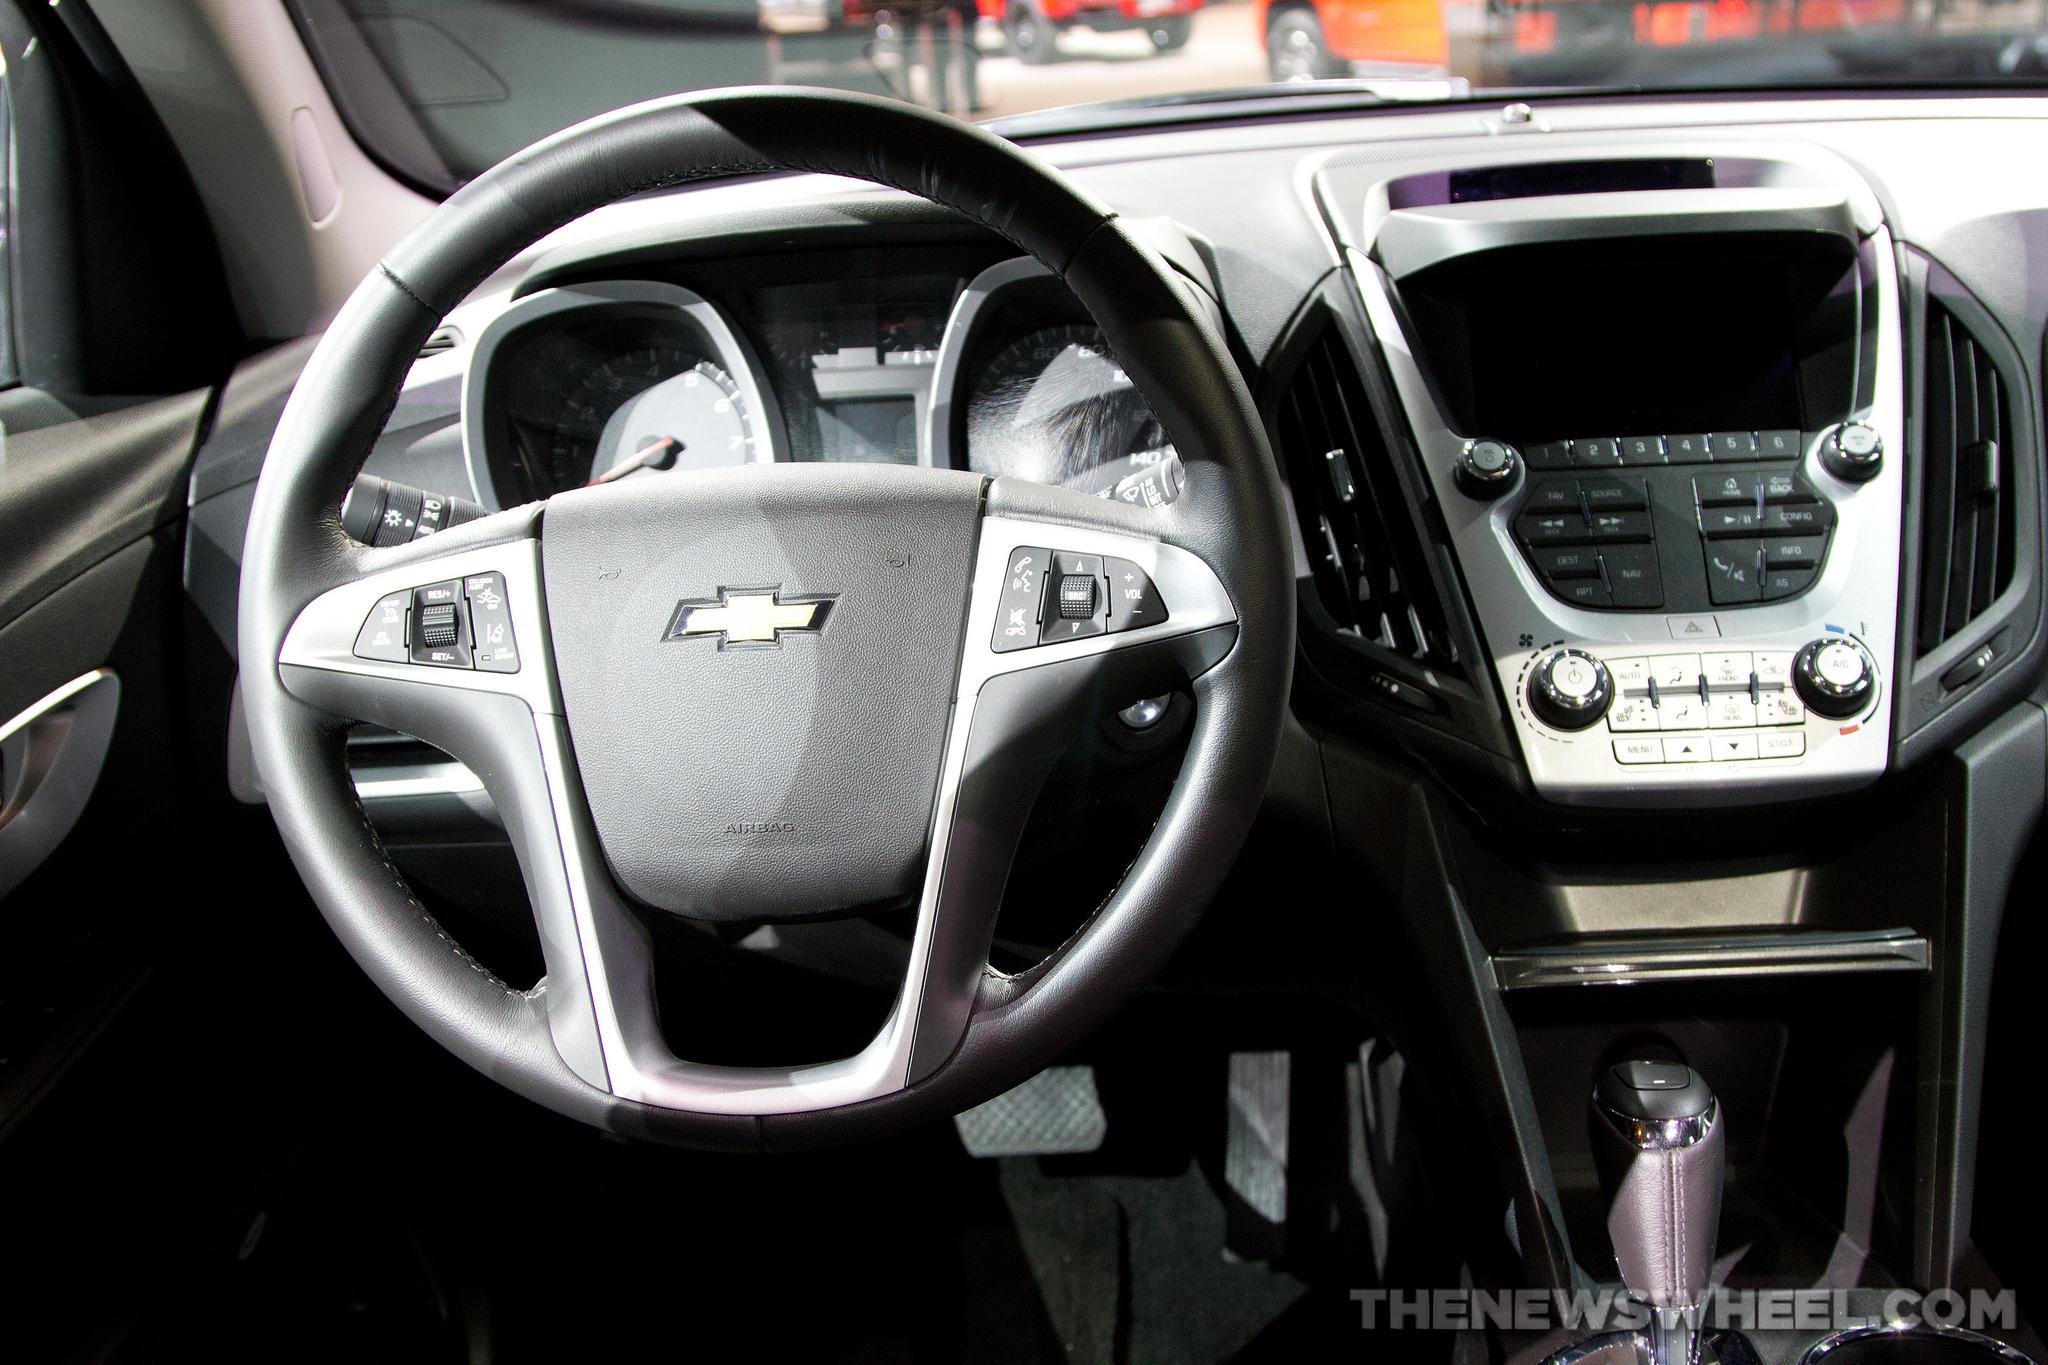 Interior Of Chevy Equinox 2016 Chevy Equinox interior | The News Wheel